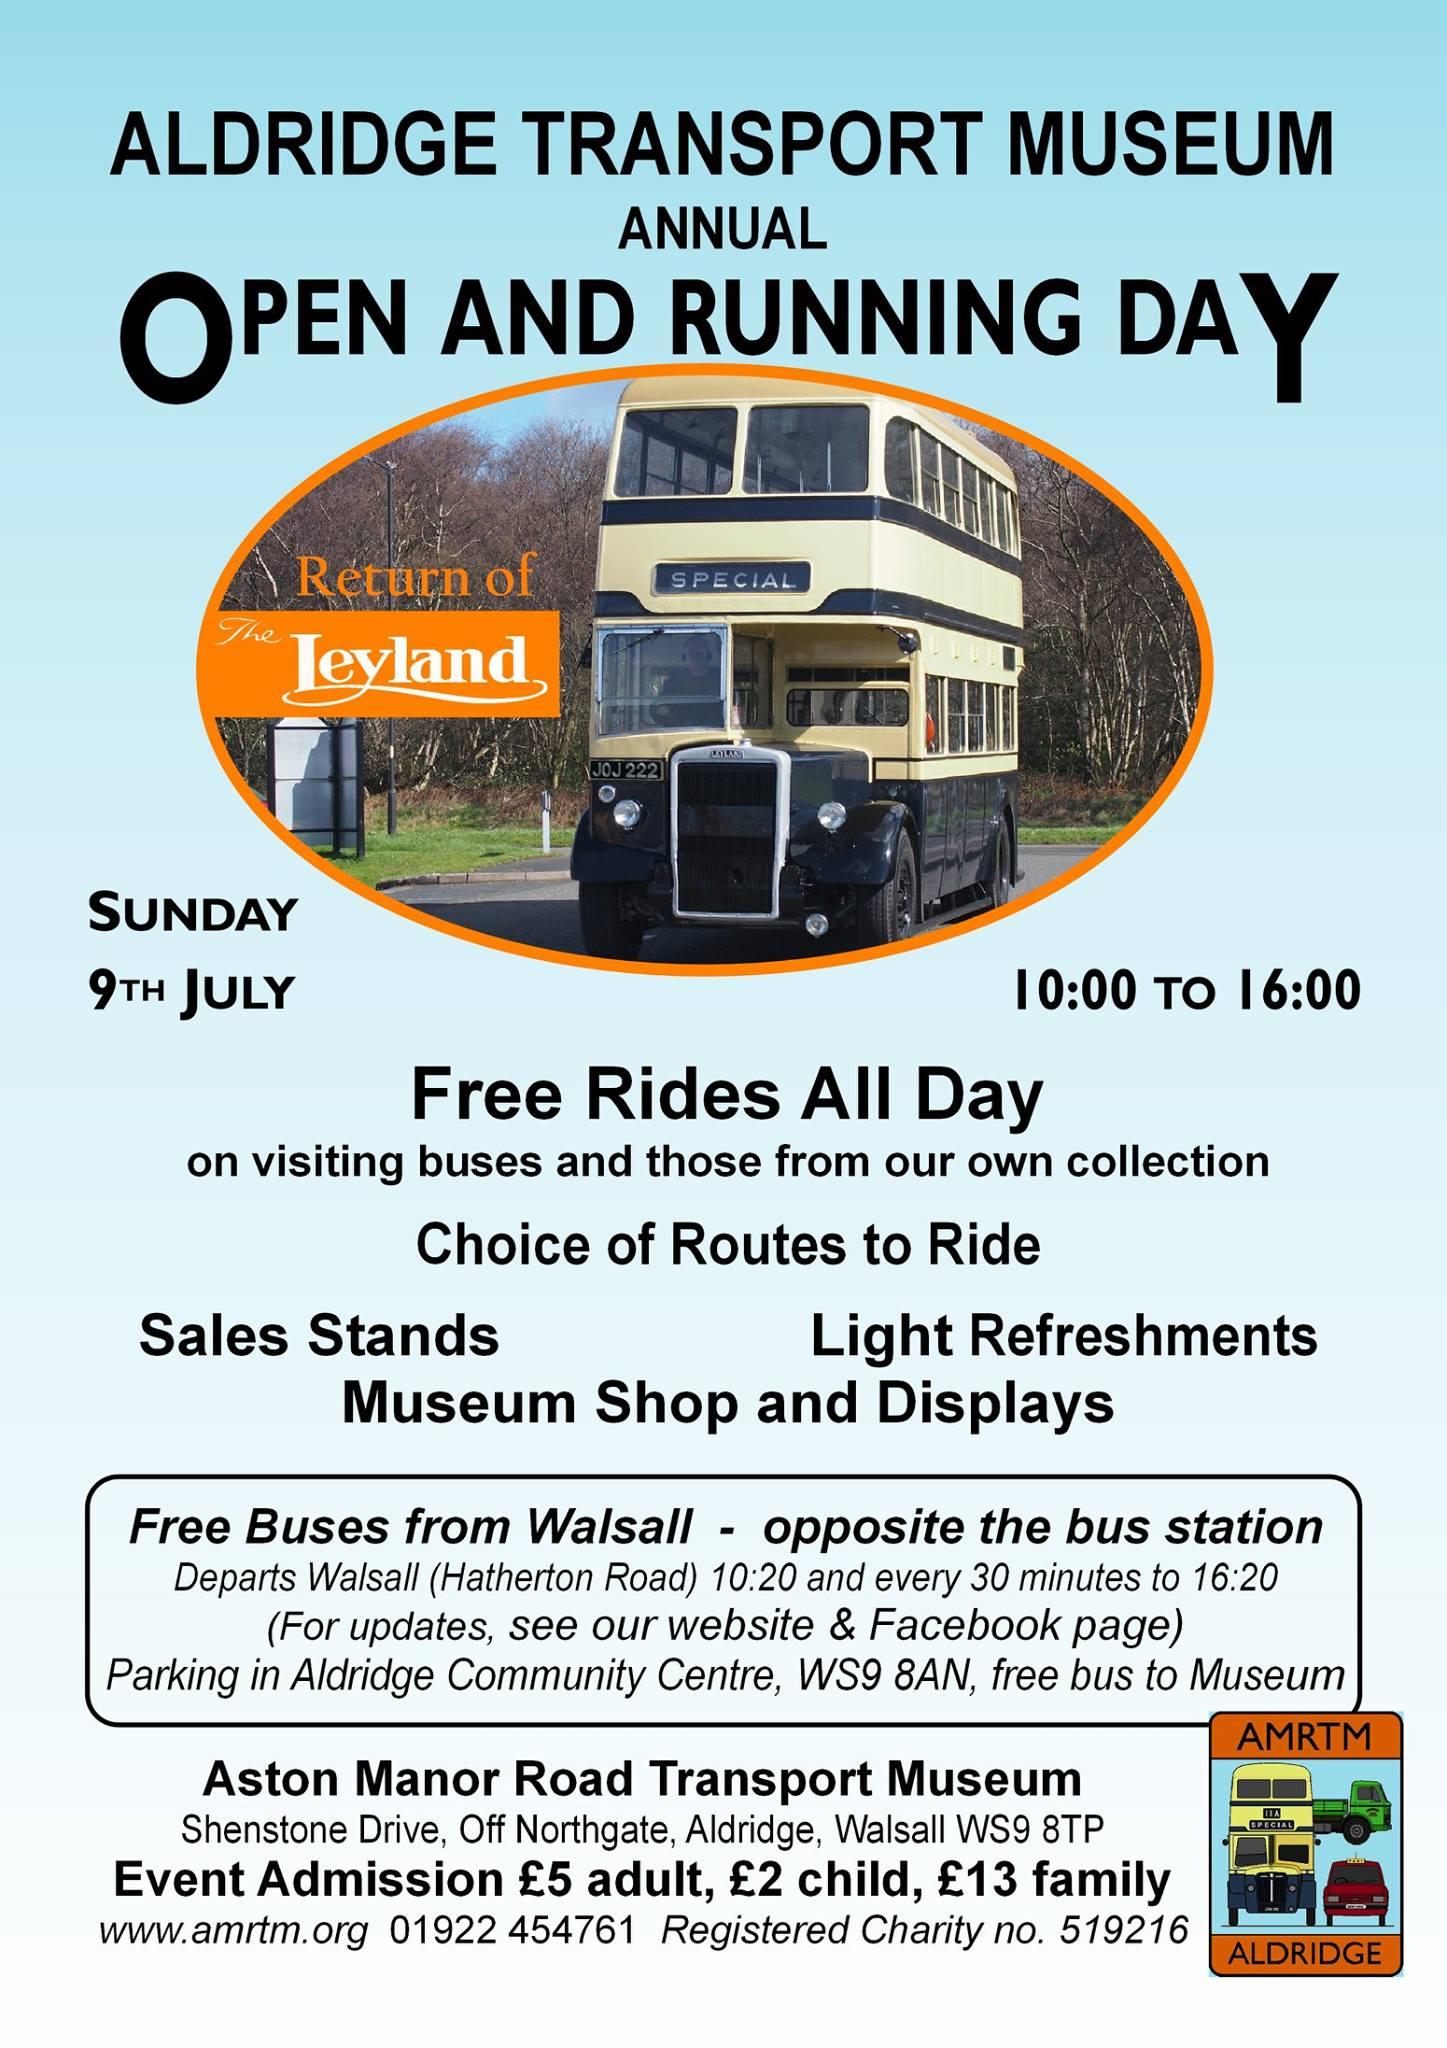 Aston Manor Transport Museum In Aldridge Annual Running Day Today